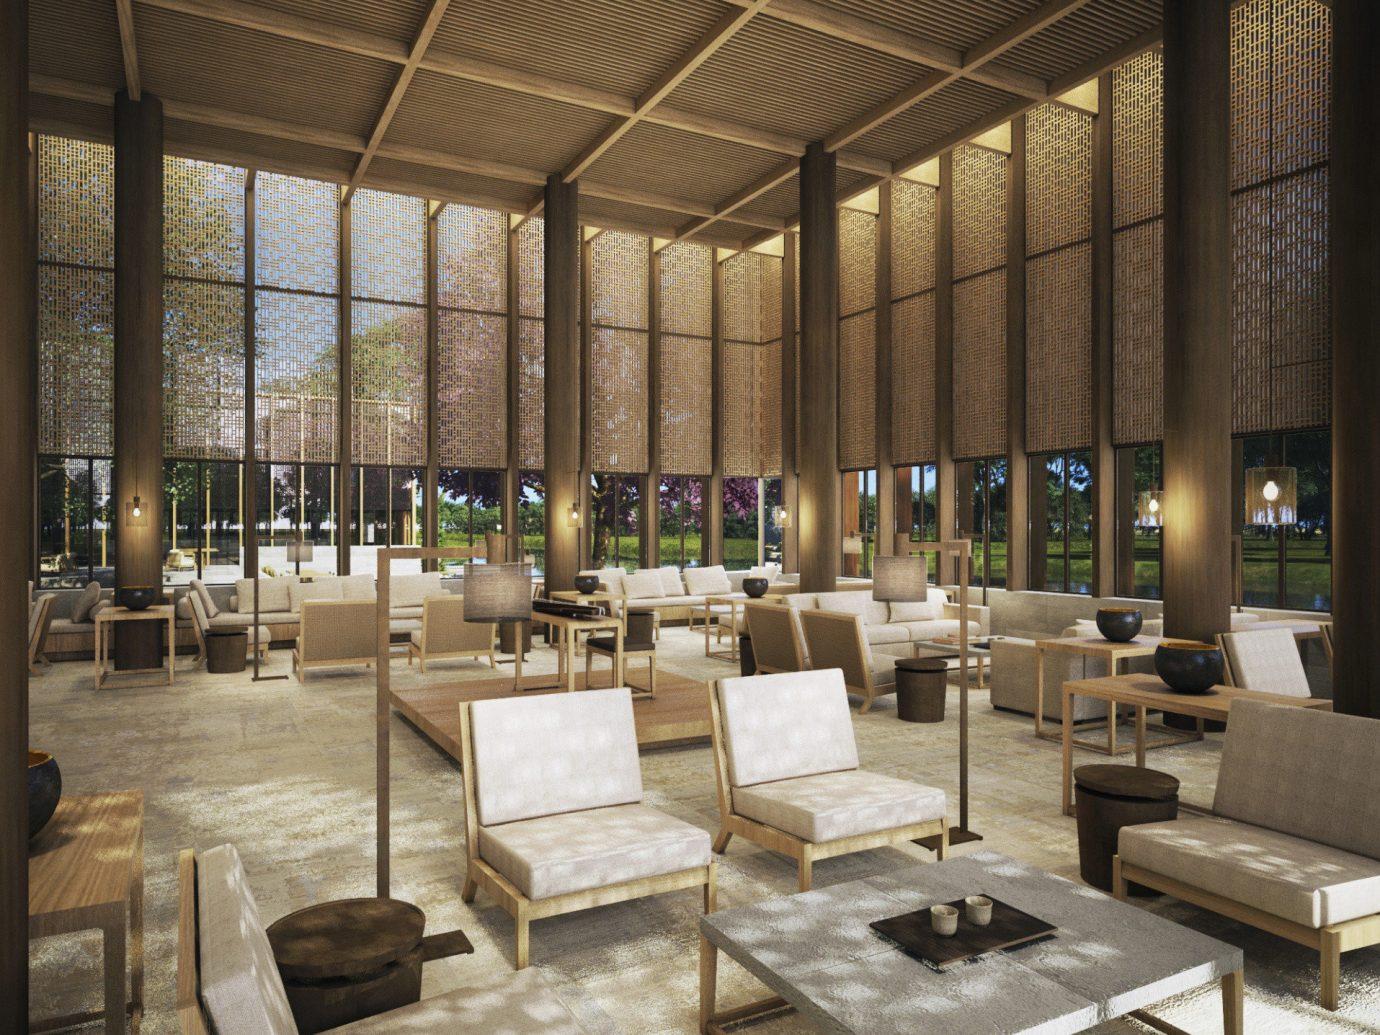 Trip Ideas indoor interior design furniture Lobby daylighting area several